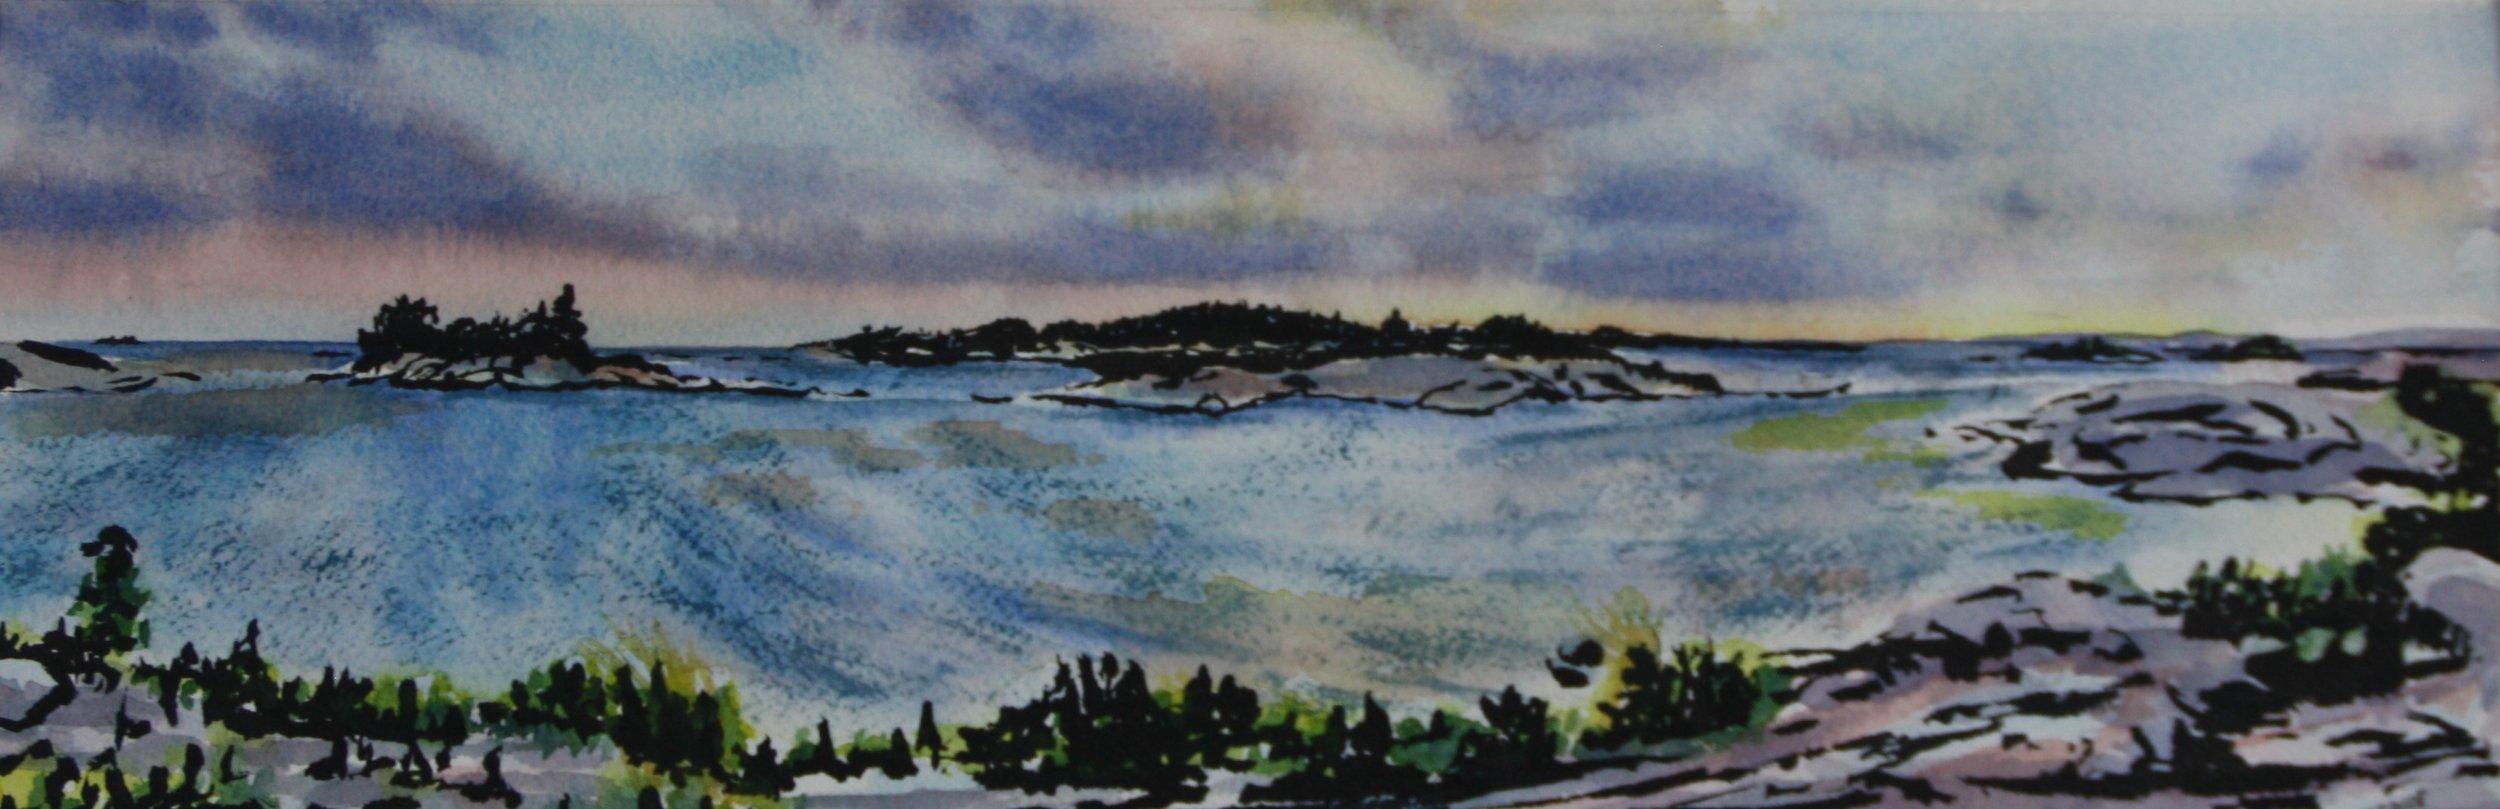 "KILLARNEY#3, watercolour & ink, 10"" x 4"""